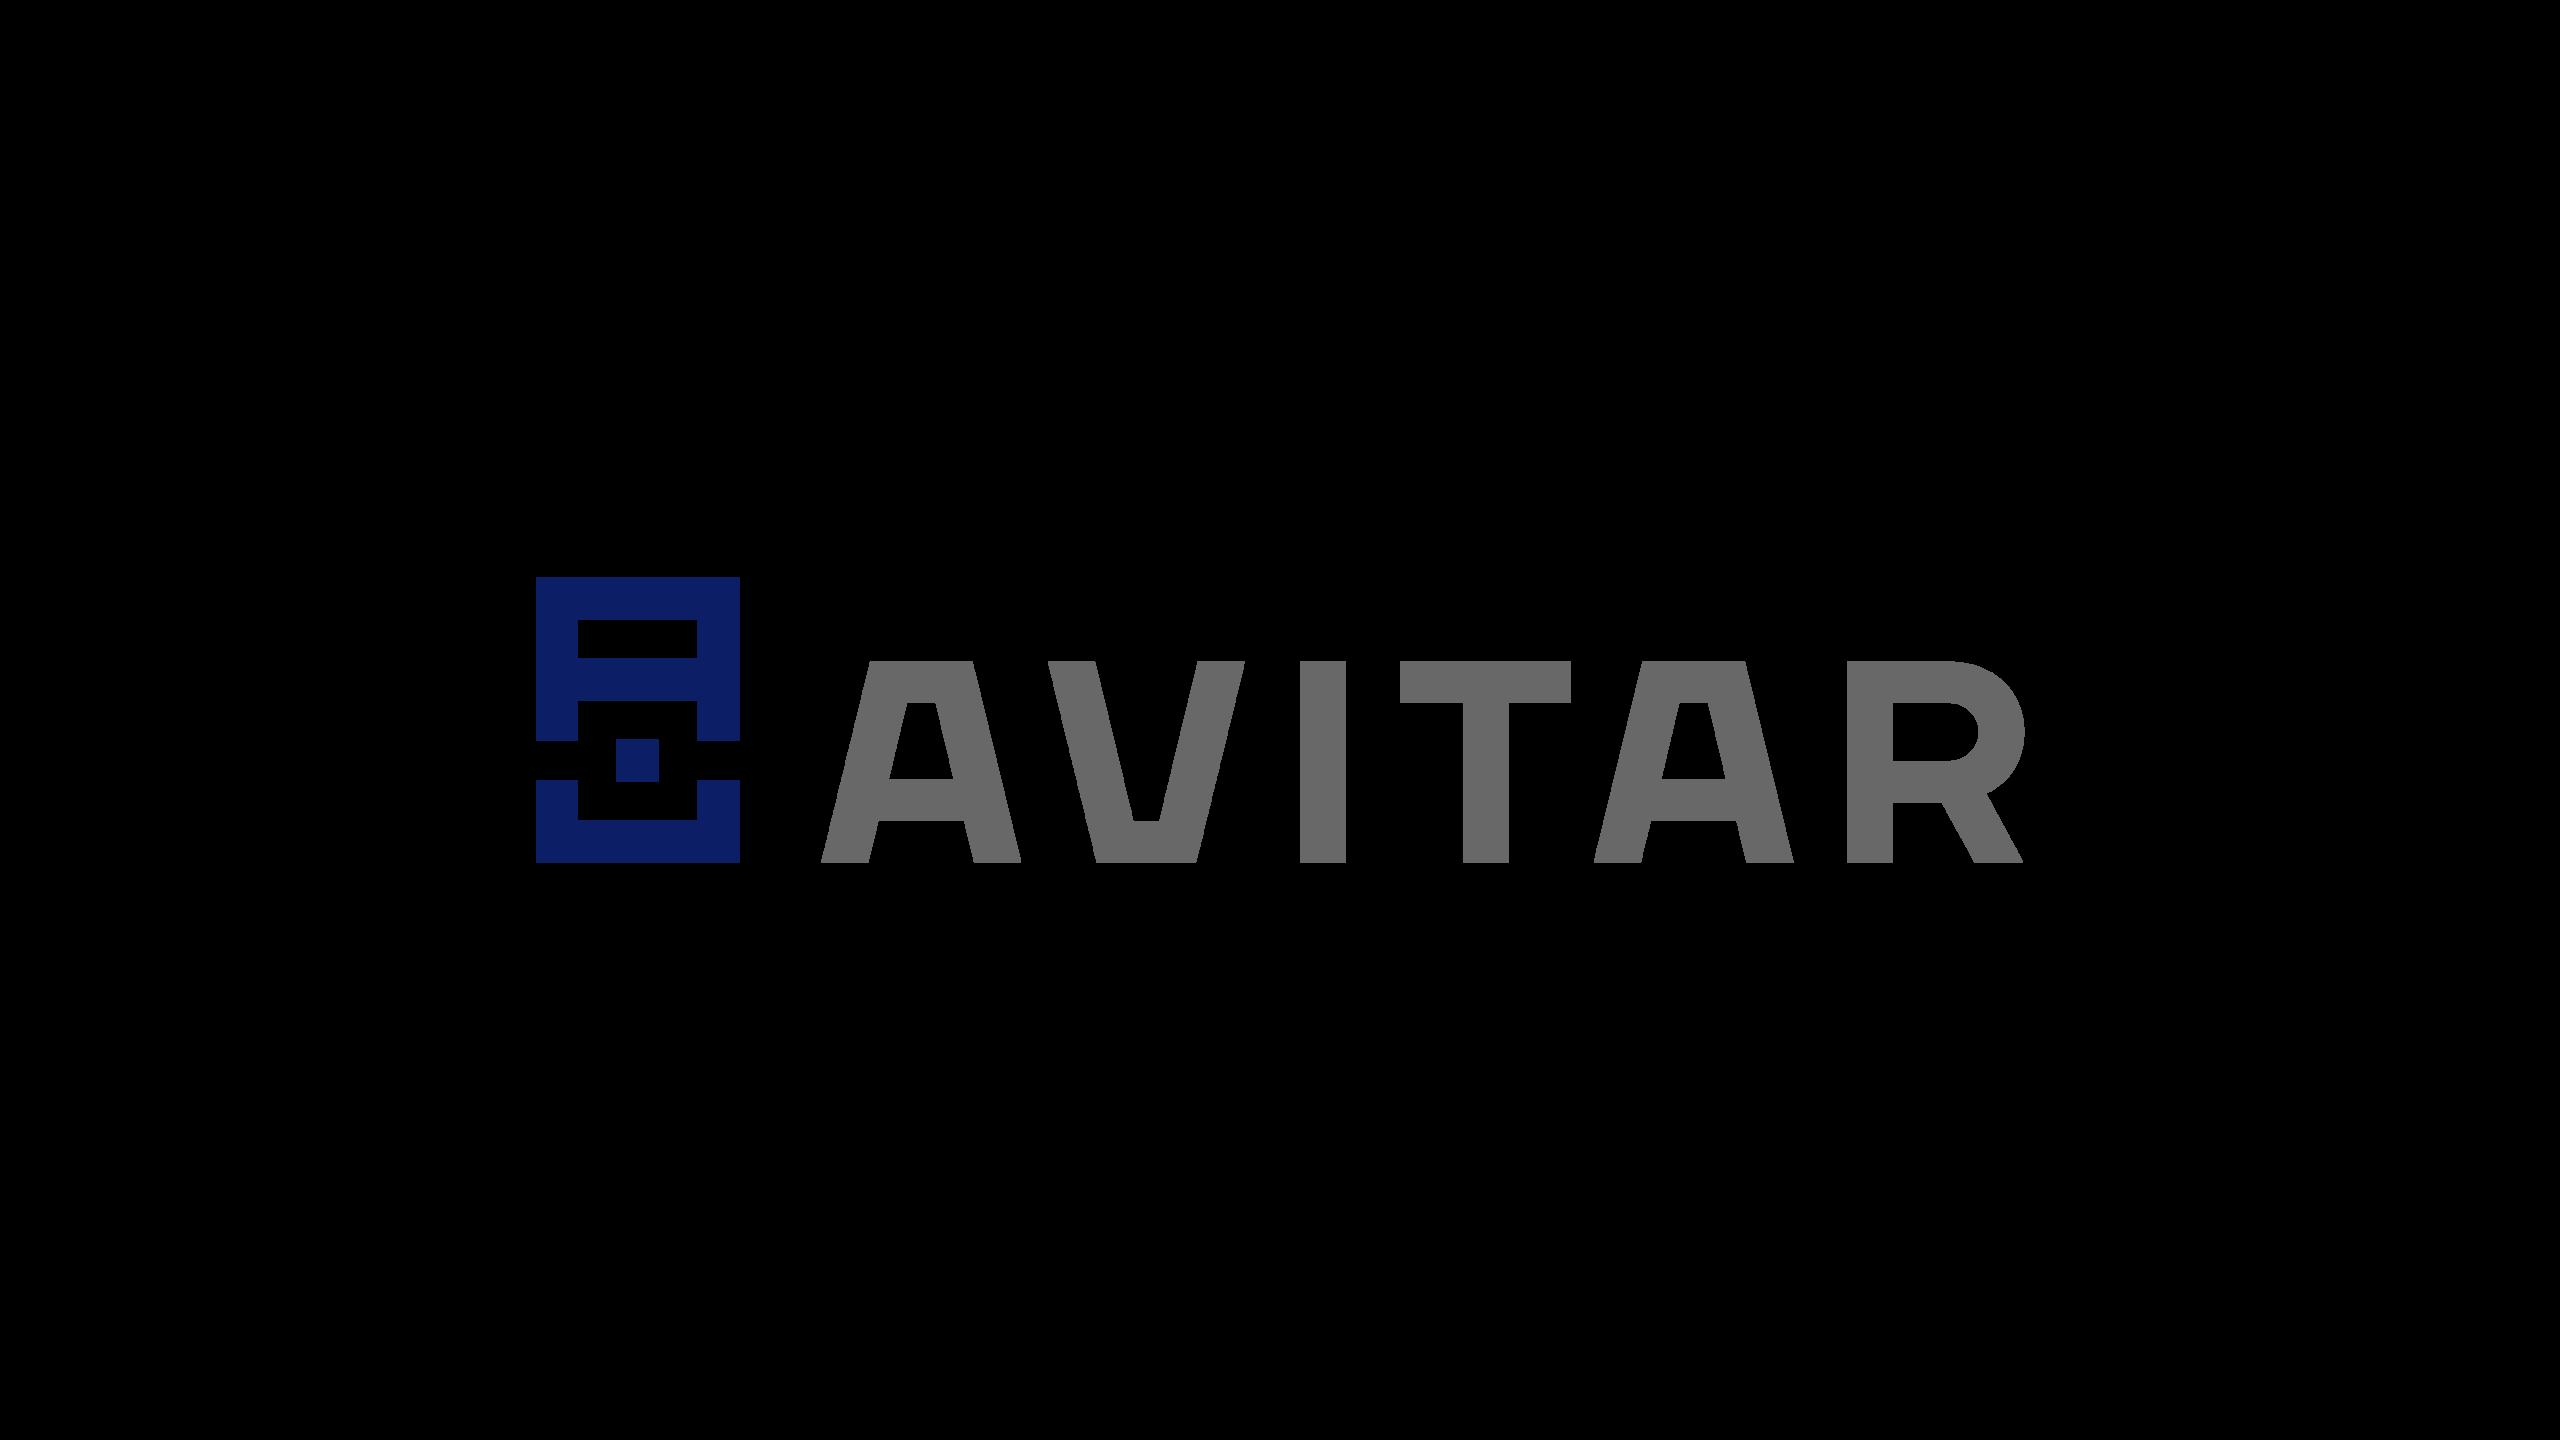 AVITAR